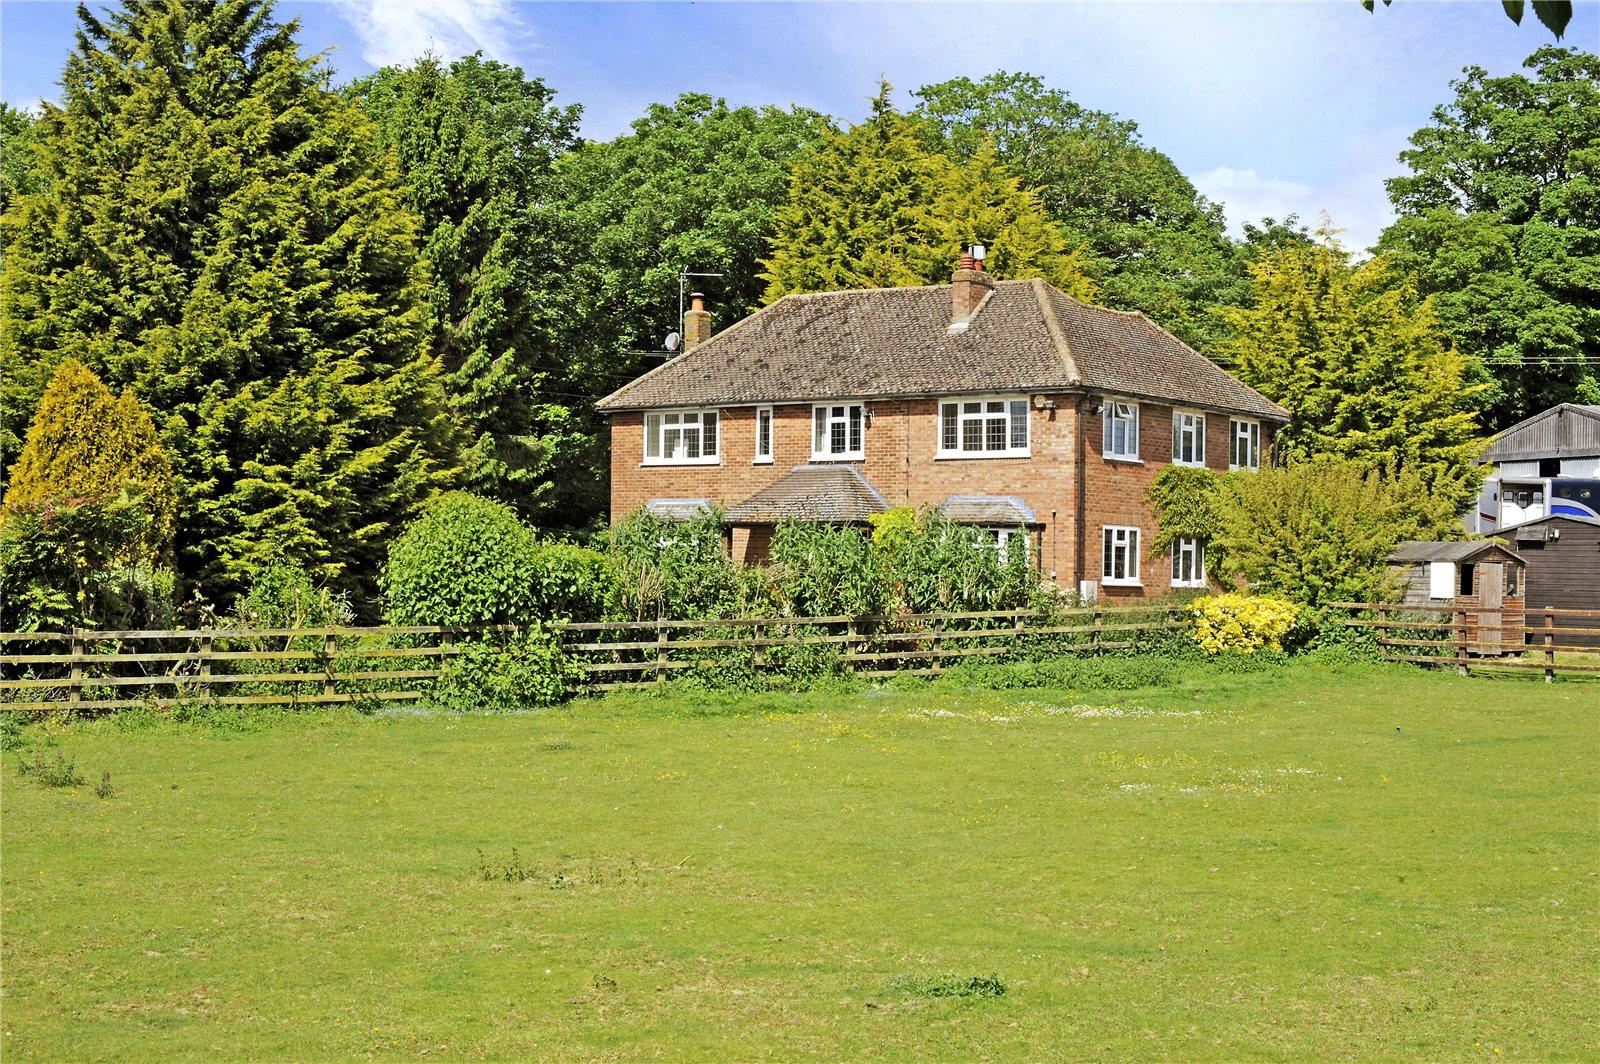 Tek Ailelik Ev için Satış at Wellbury Park, Hitchin, Hertfordshire, SG5 Hitchin, Ingiltere